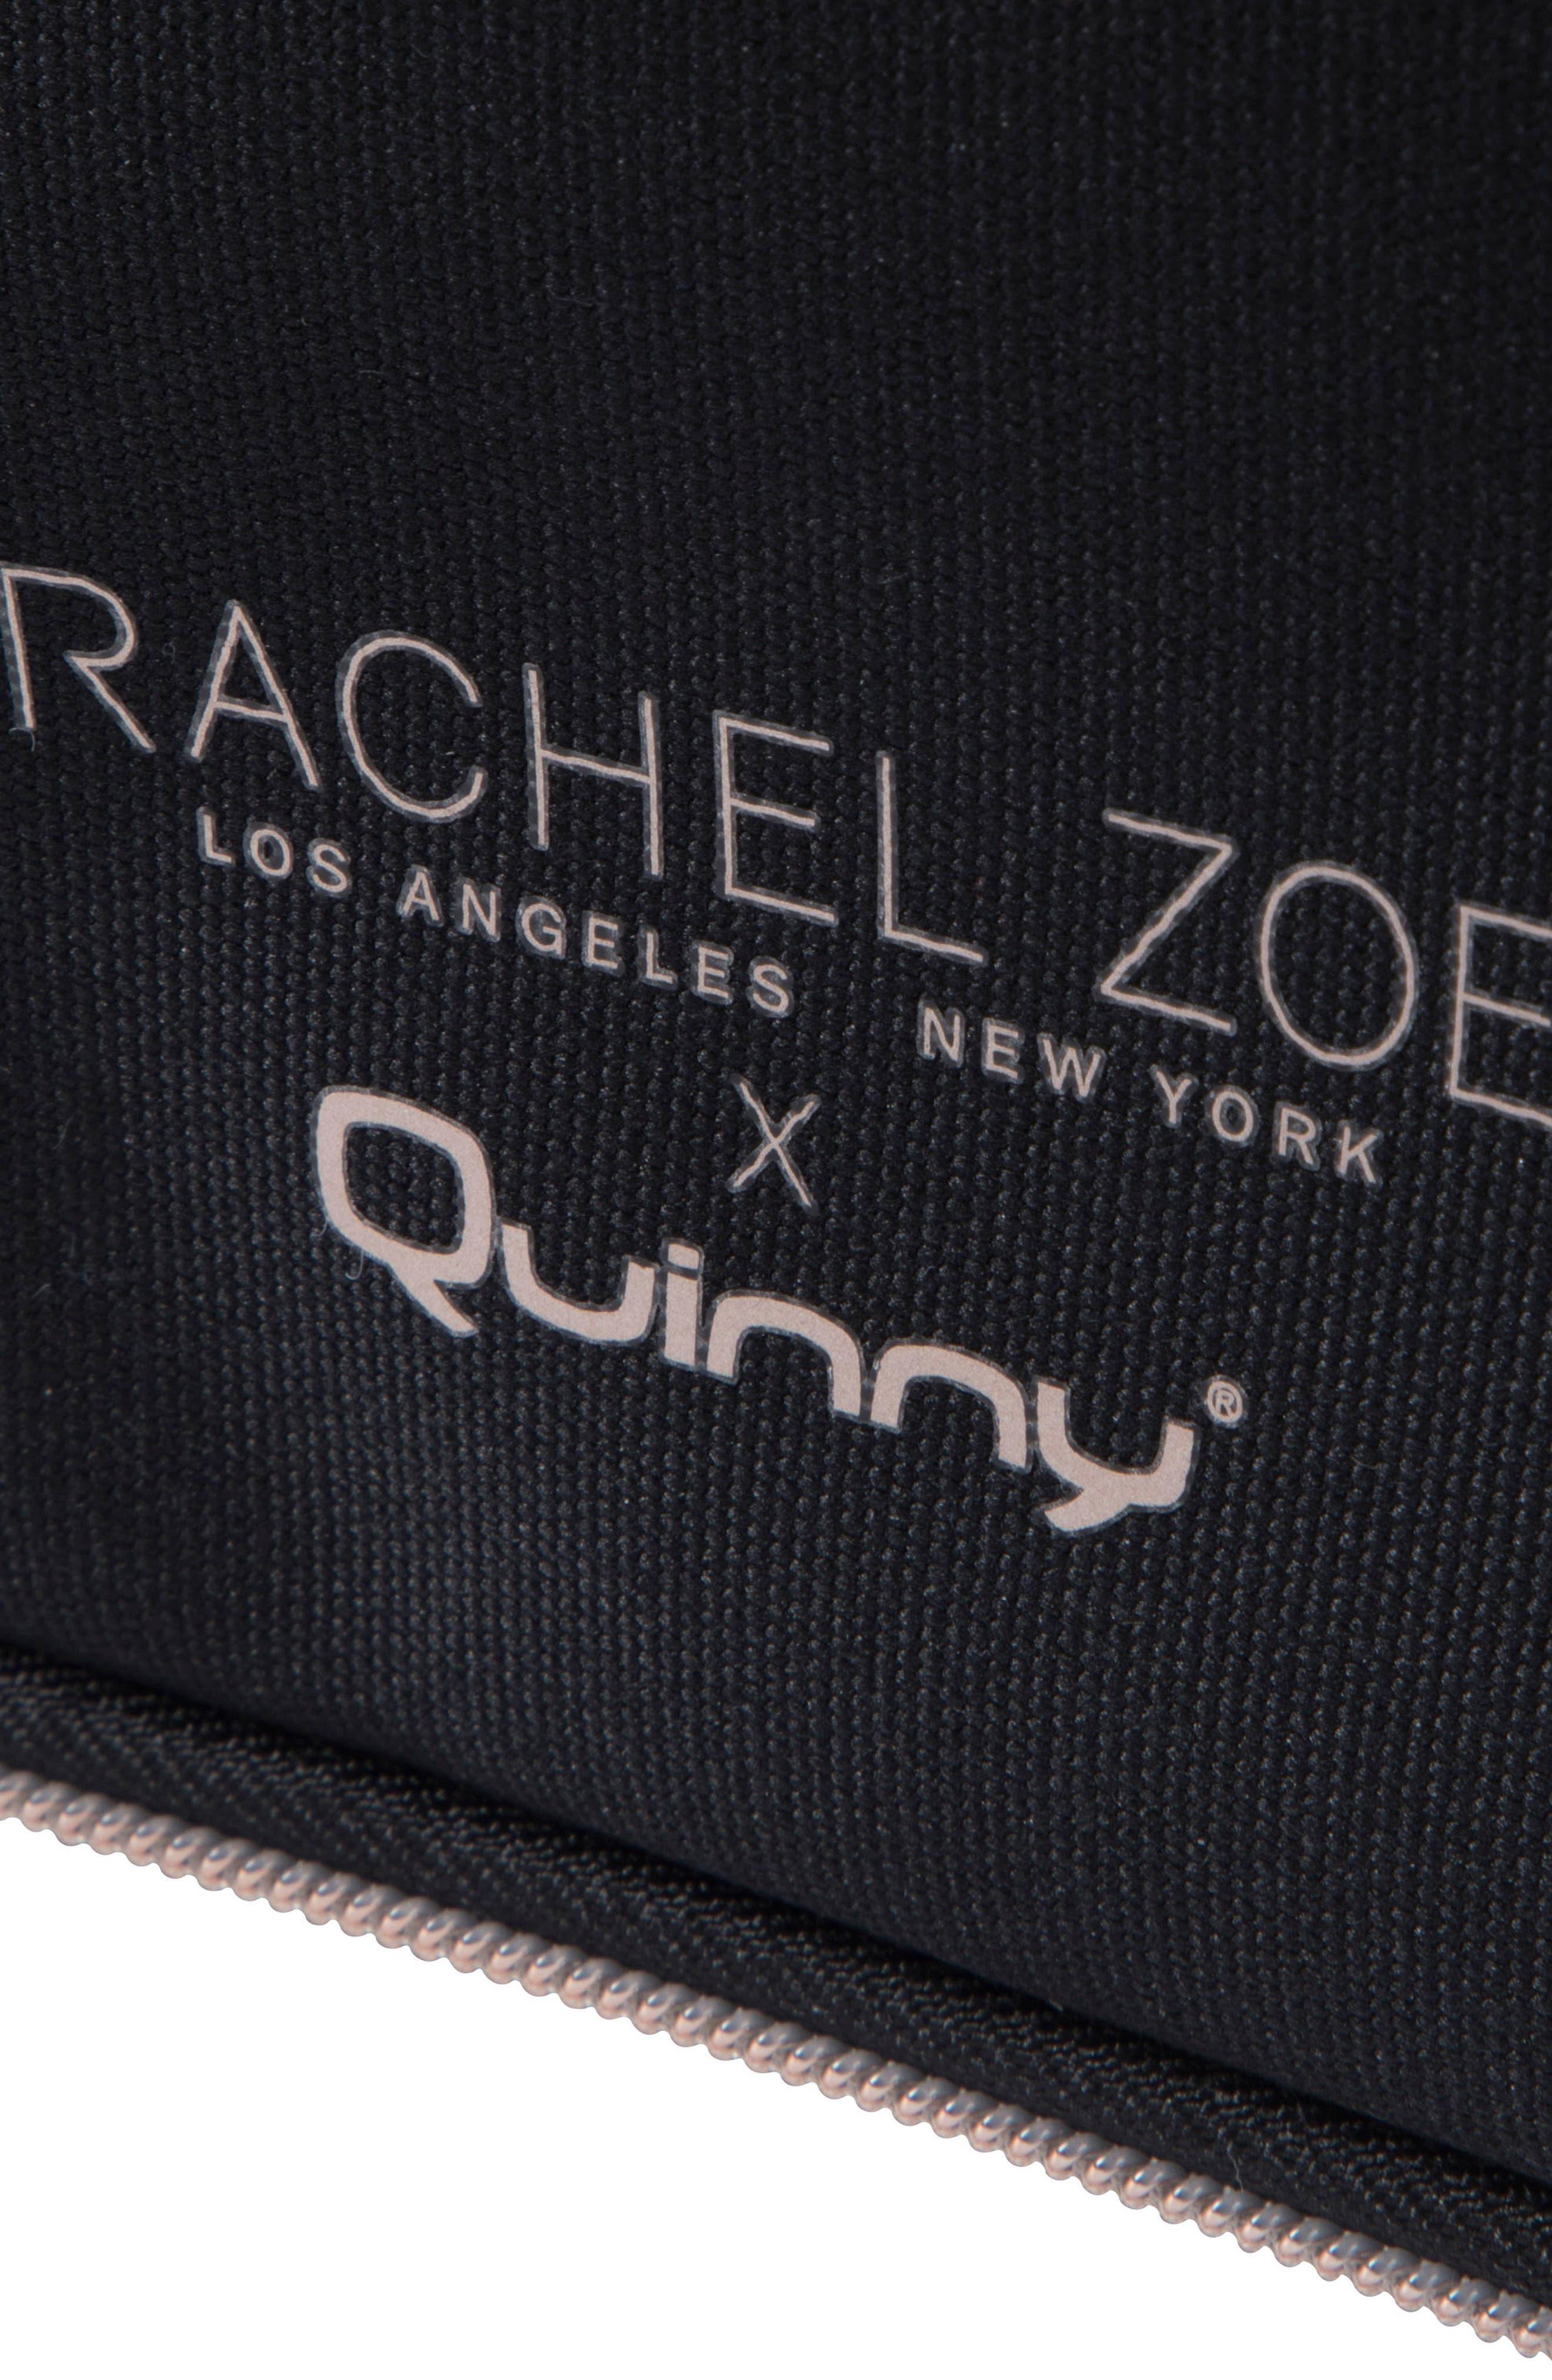 x Rachel Zoe Luxe Sport Diaper Bag,                             Alternate thumbnail 10, color,                             Rz Luxe Sport